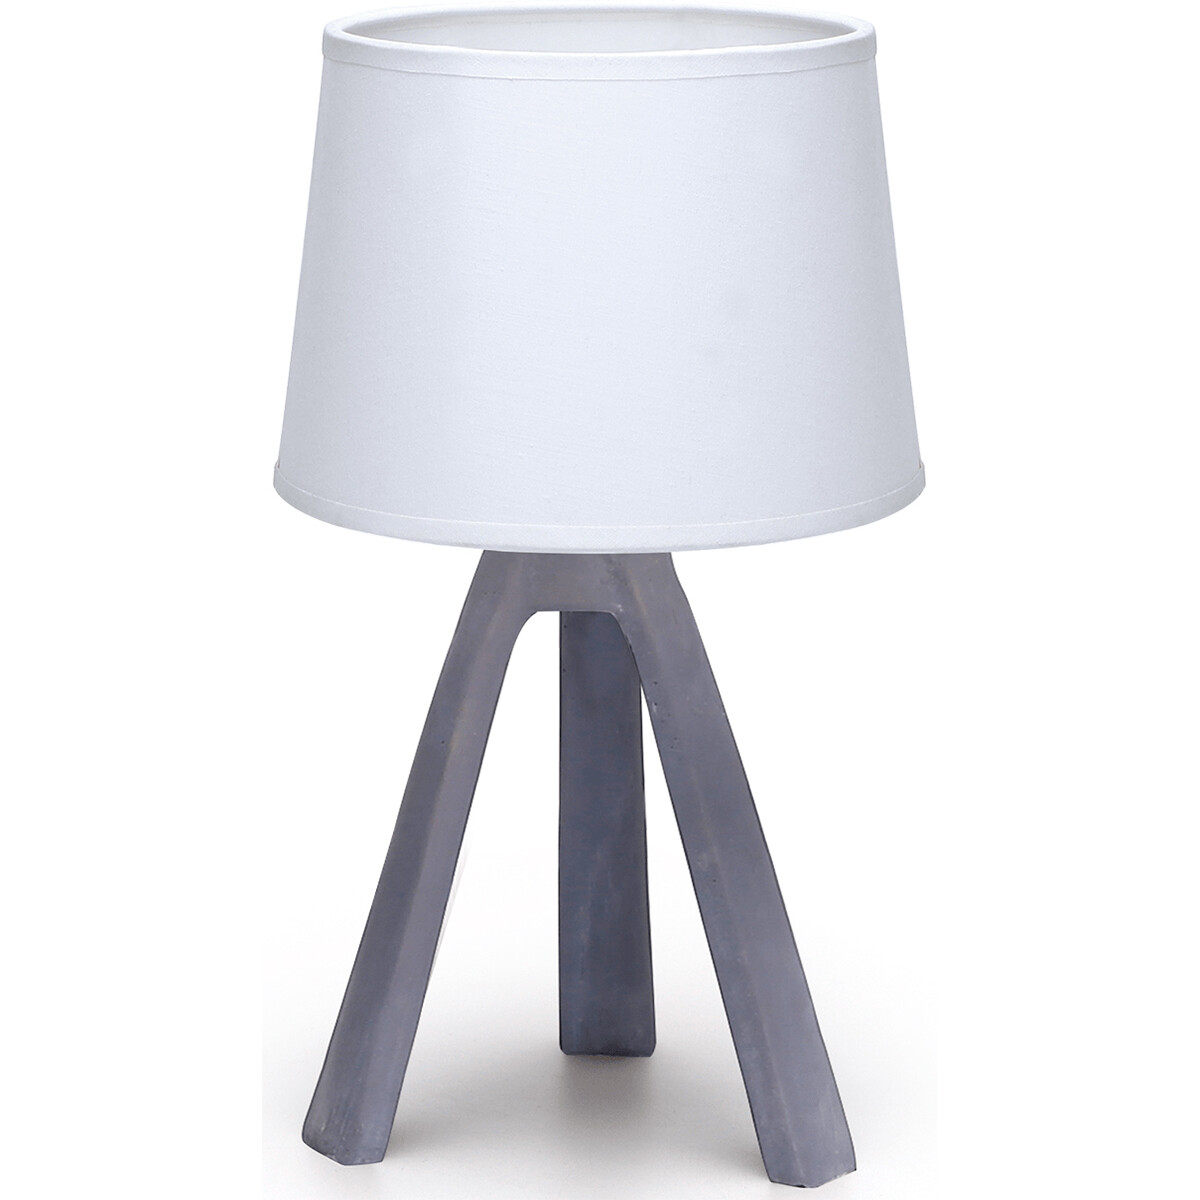 LED Tafellamp - Tafelverlichting - Aigi Linmo - E14 Fitting - Rond - Mat Grijs - Kunststof